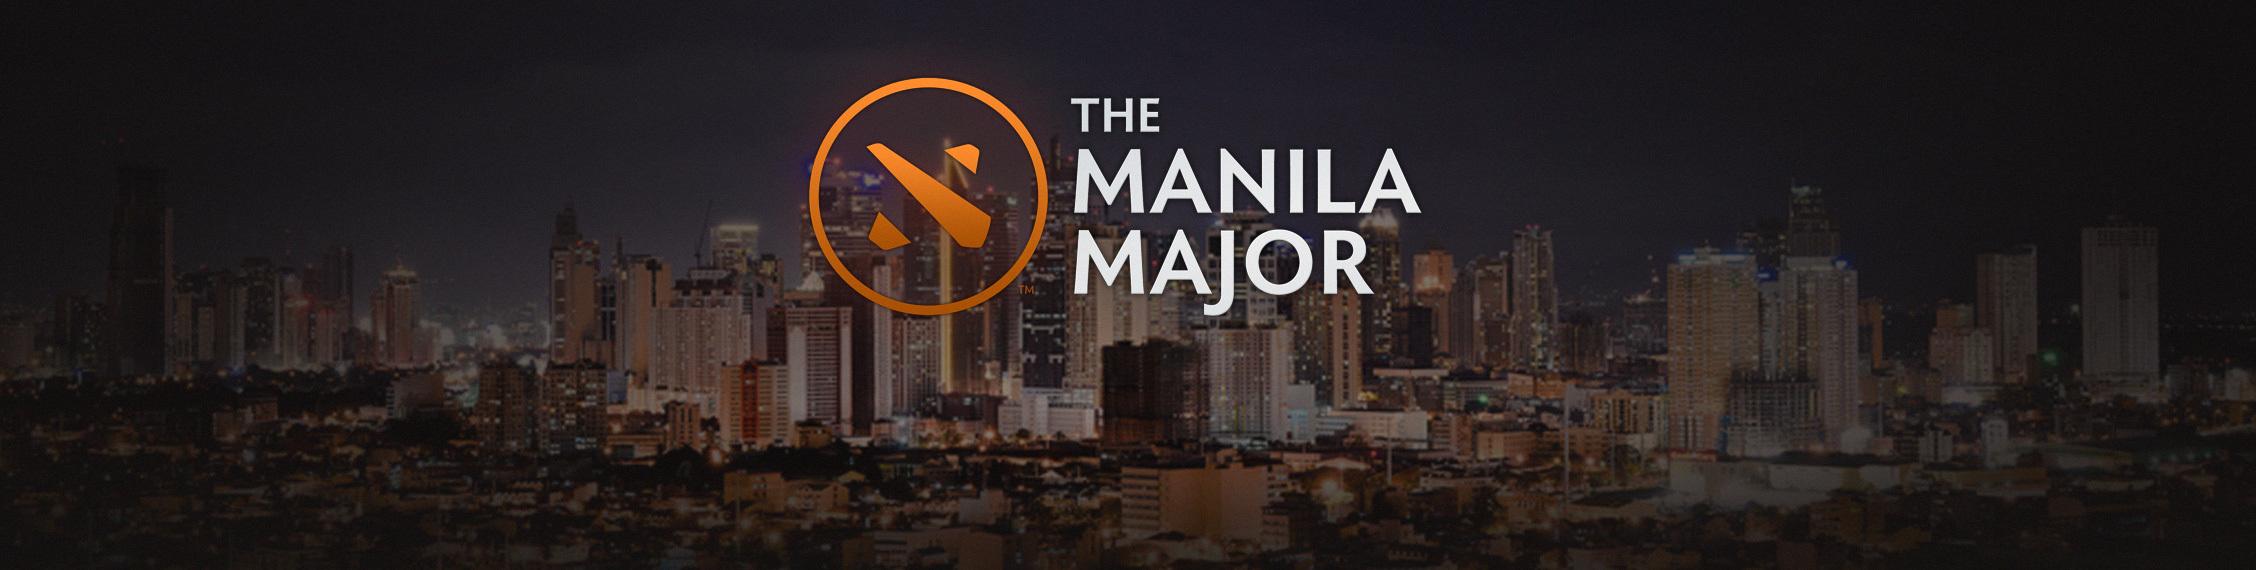 The Manila Major Qualifiers